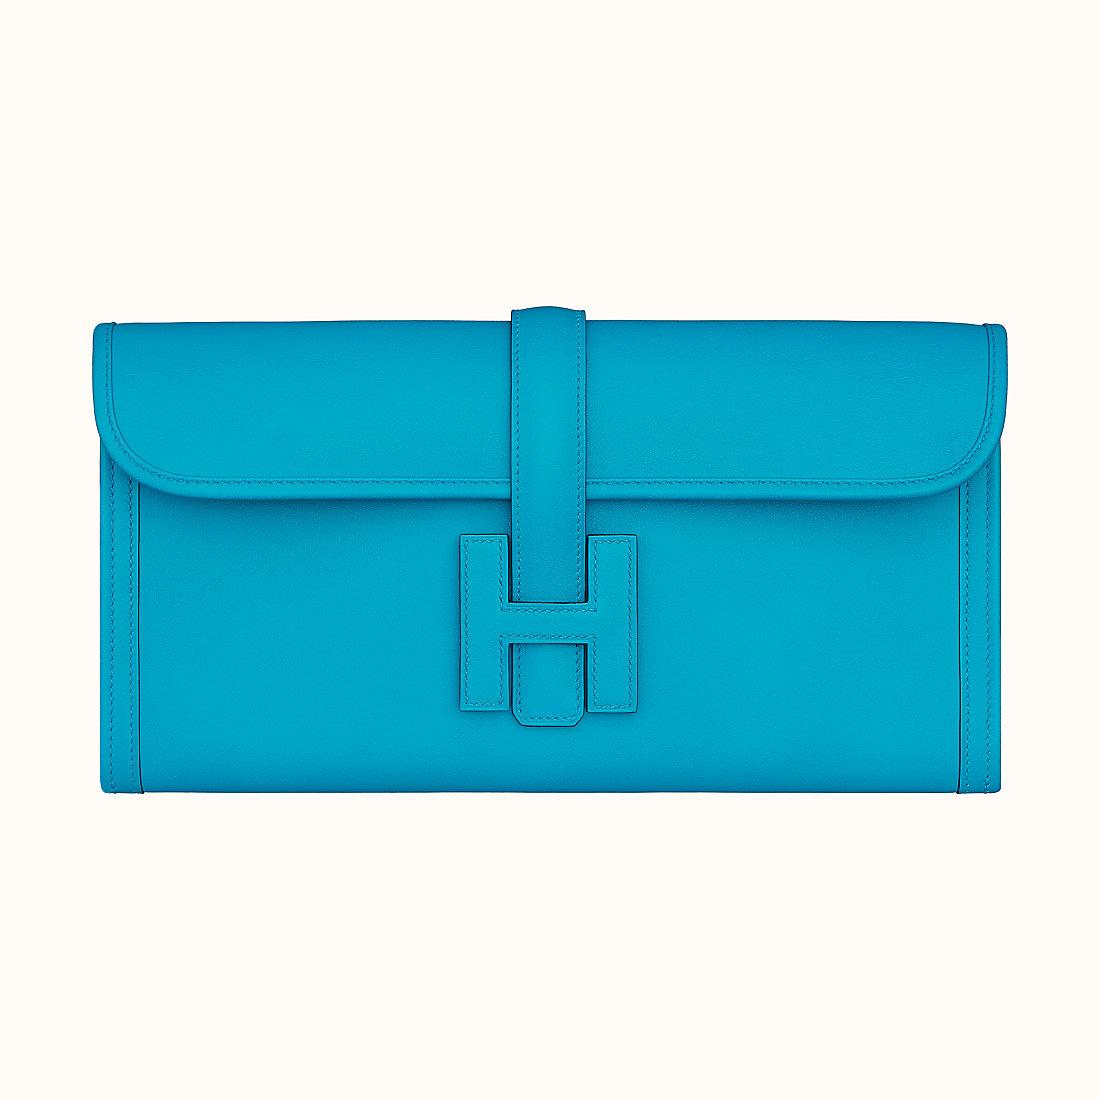 Macao Hermes Jige Elan 29 verso clutch Bleu Frida/Rose Mexico